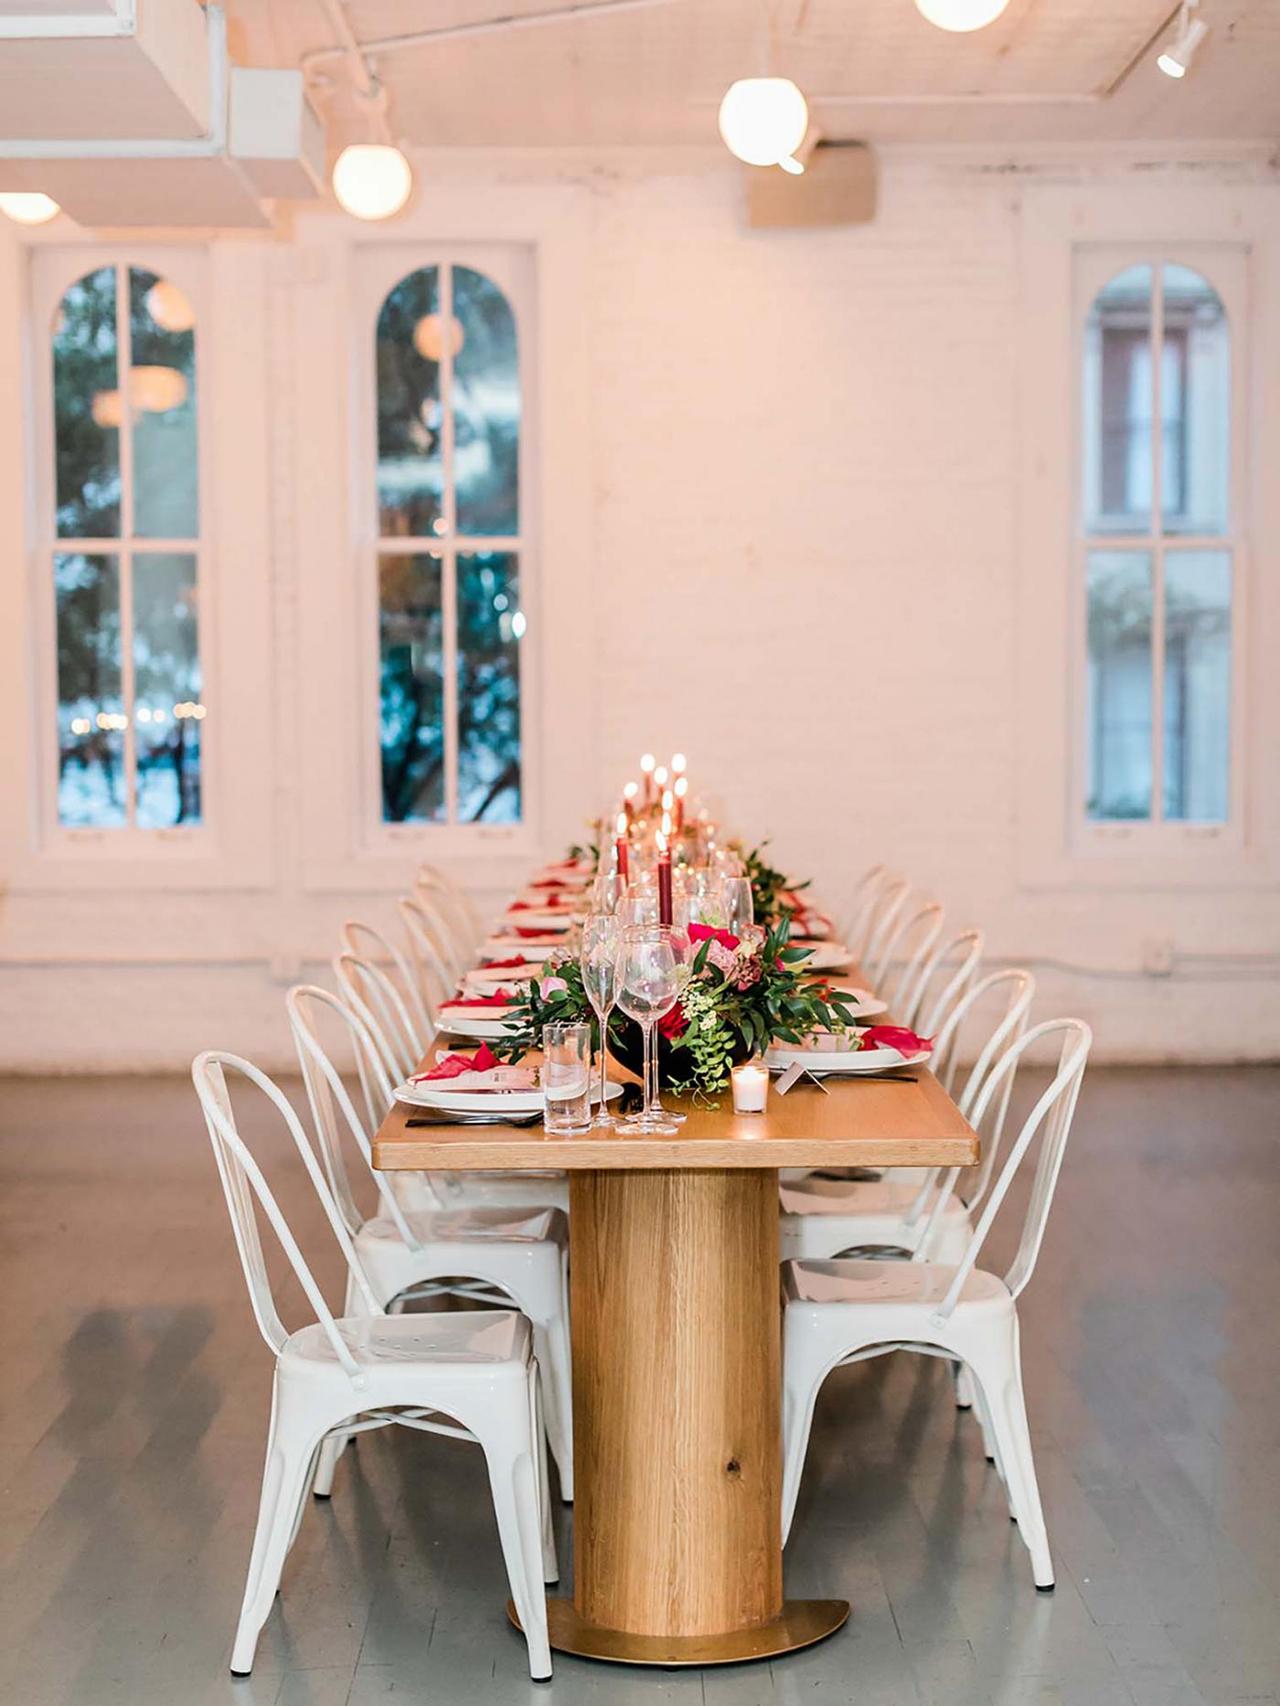 wedding venue white brick walls wood floors dining set up